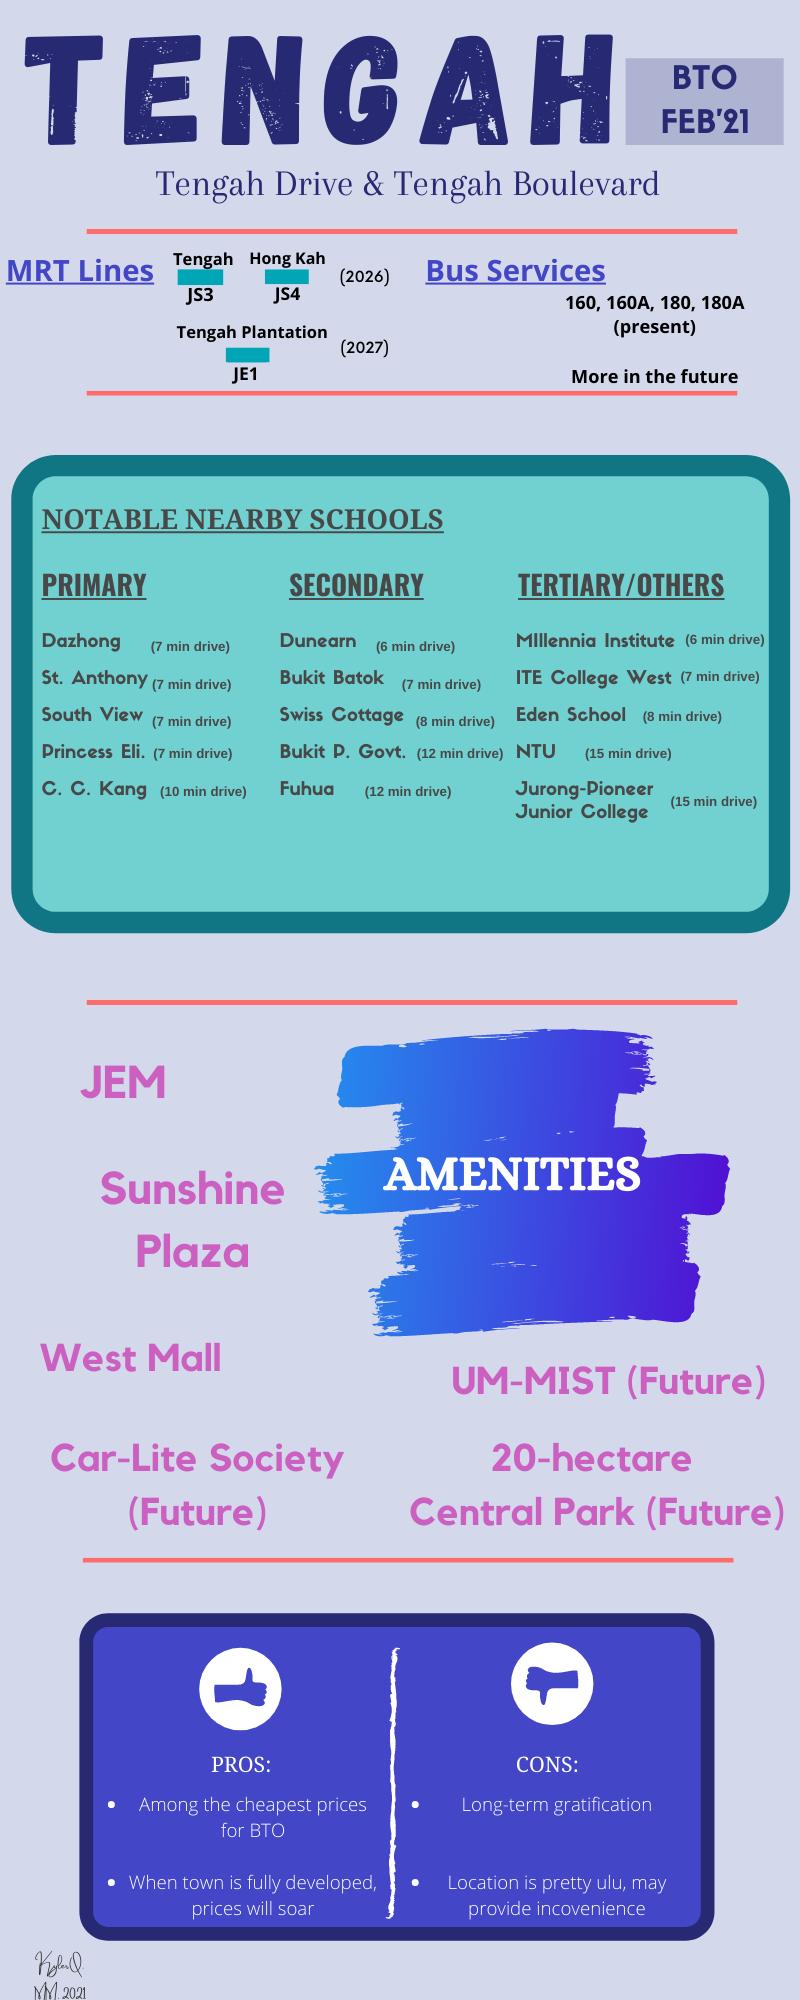 Infographic on Tengah Feb'21